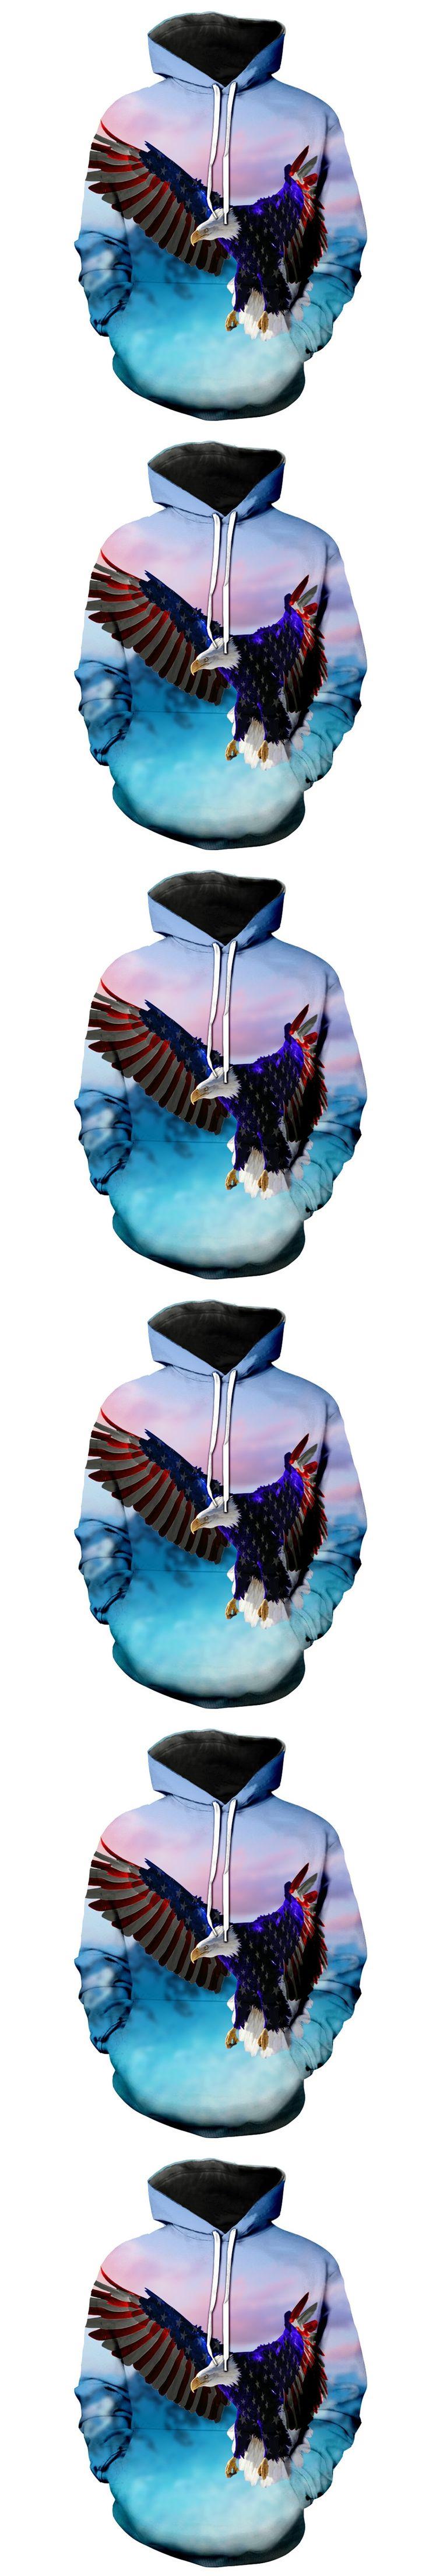 2017 FASHION MEN WOMEN American flag Eagle Flying HOODIE 3D Hoodie Sweatshirts Pullovers Autumn Tracksuit Winter Loose ThinHoody